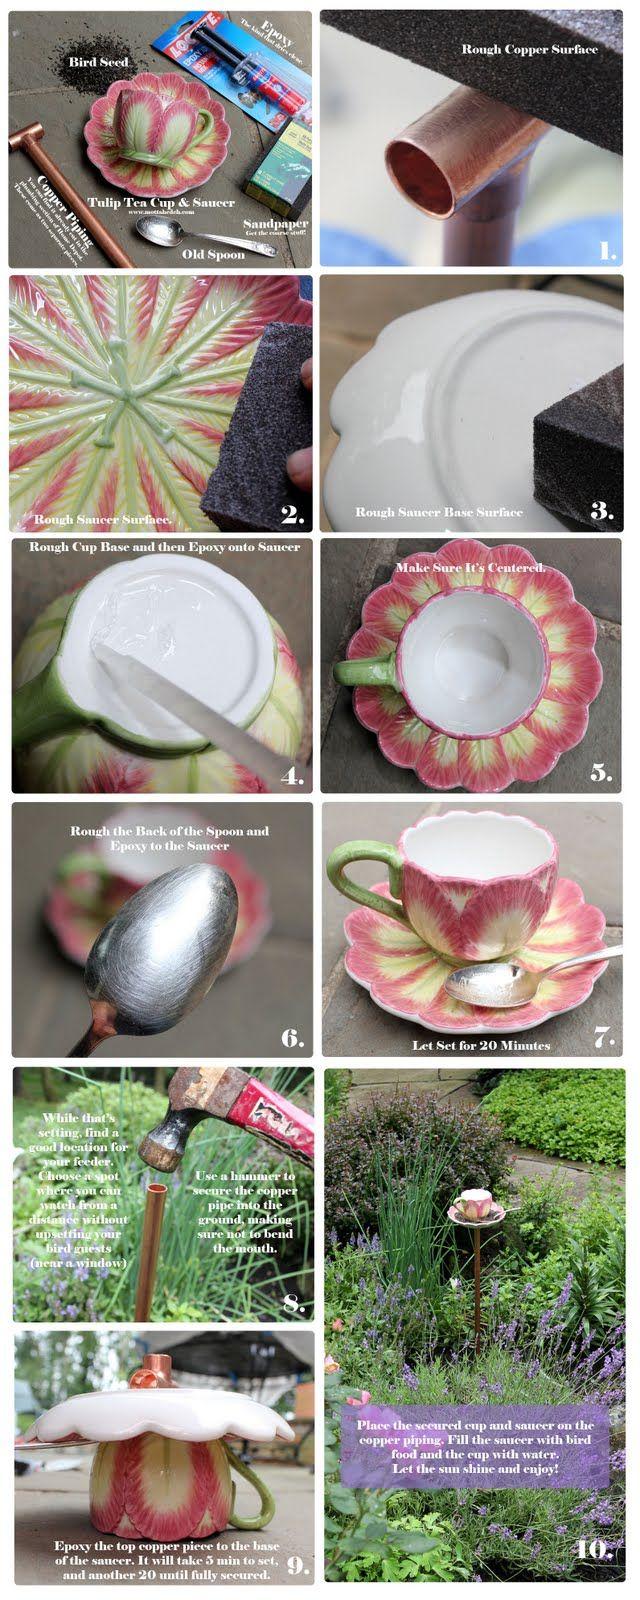 Tulip Tea Cup Bird Feeder - Mottahedeh